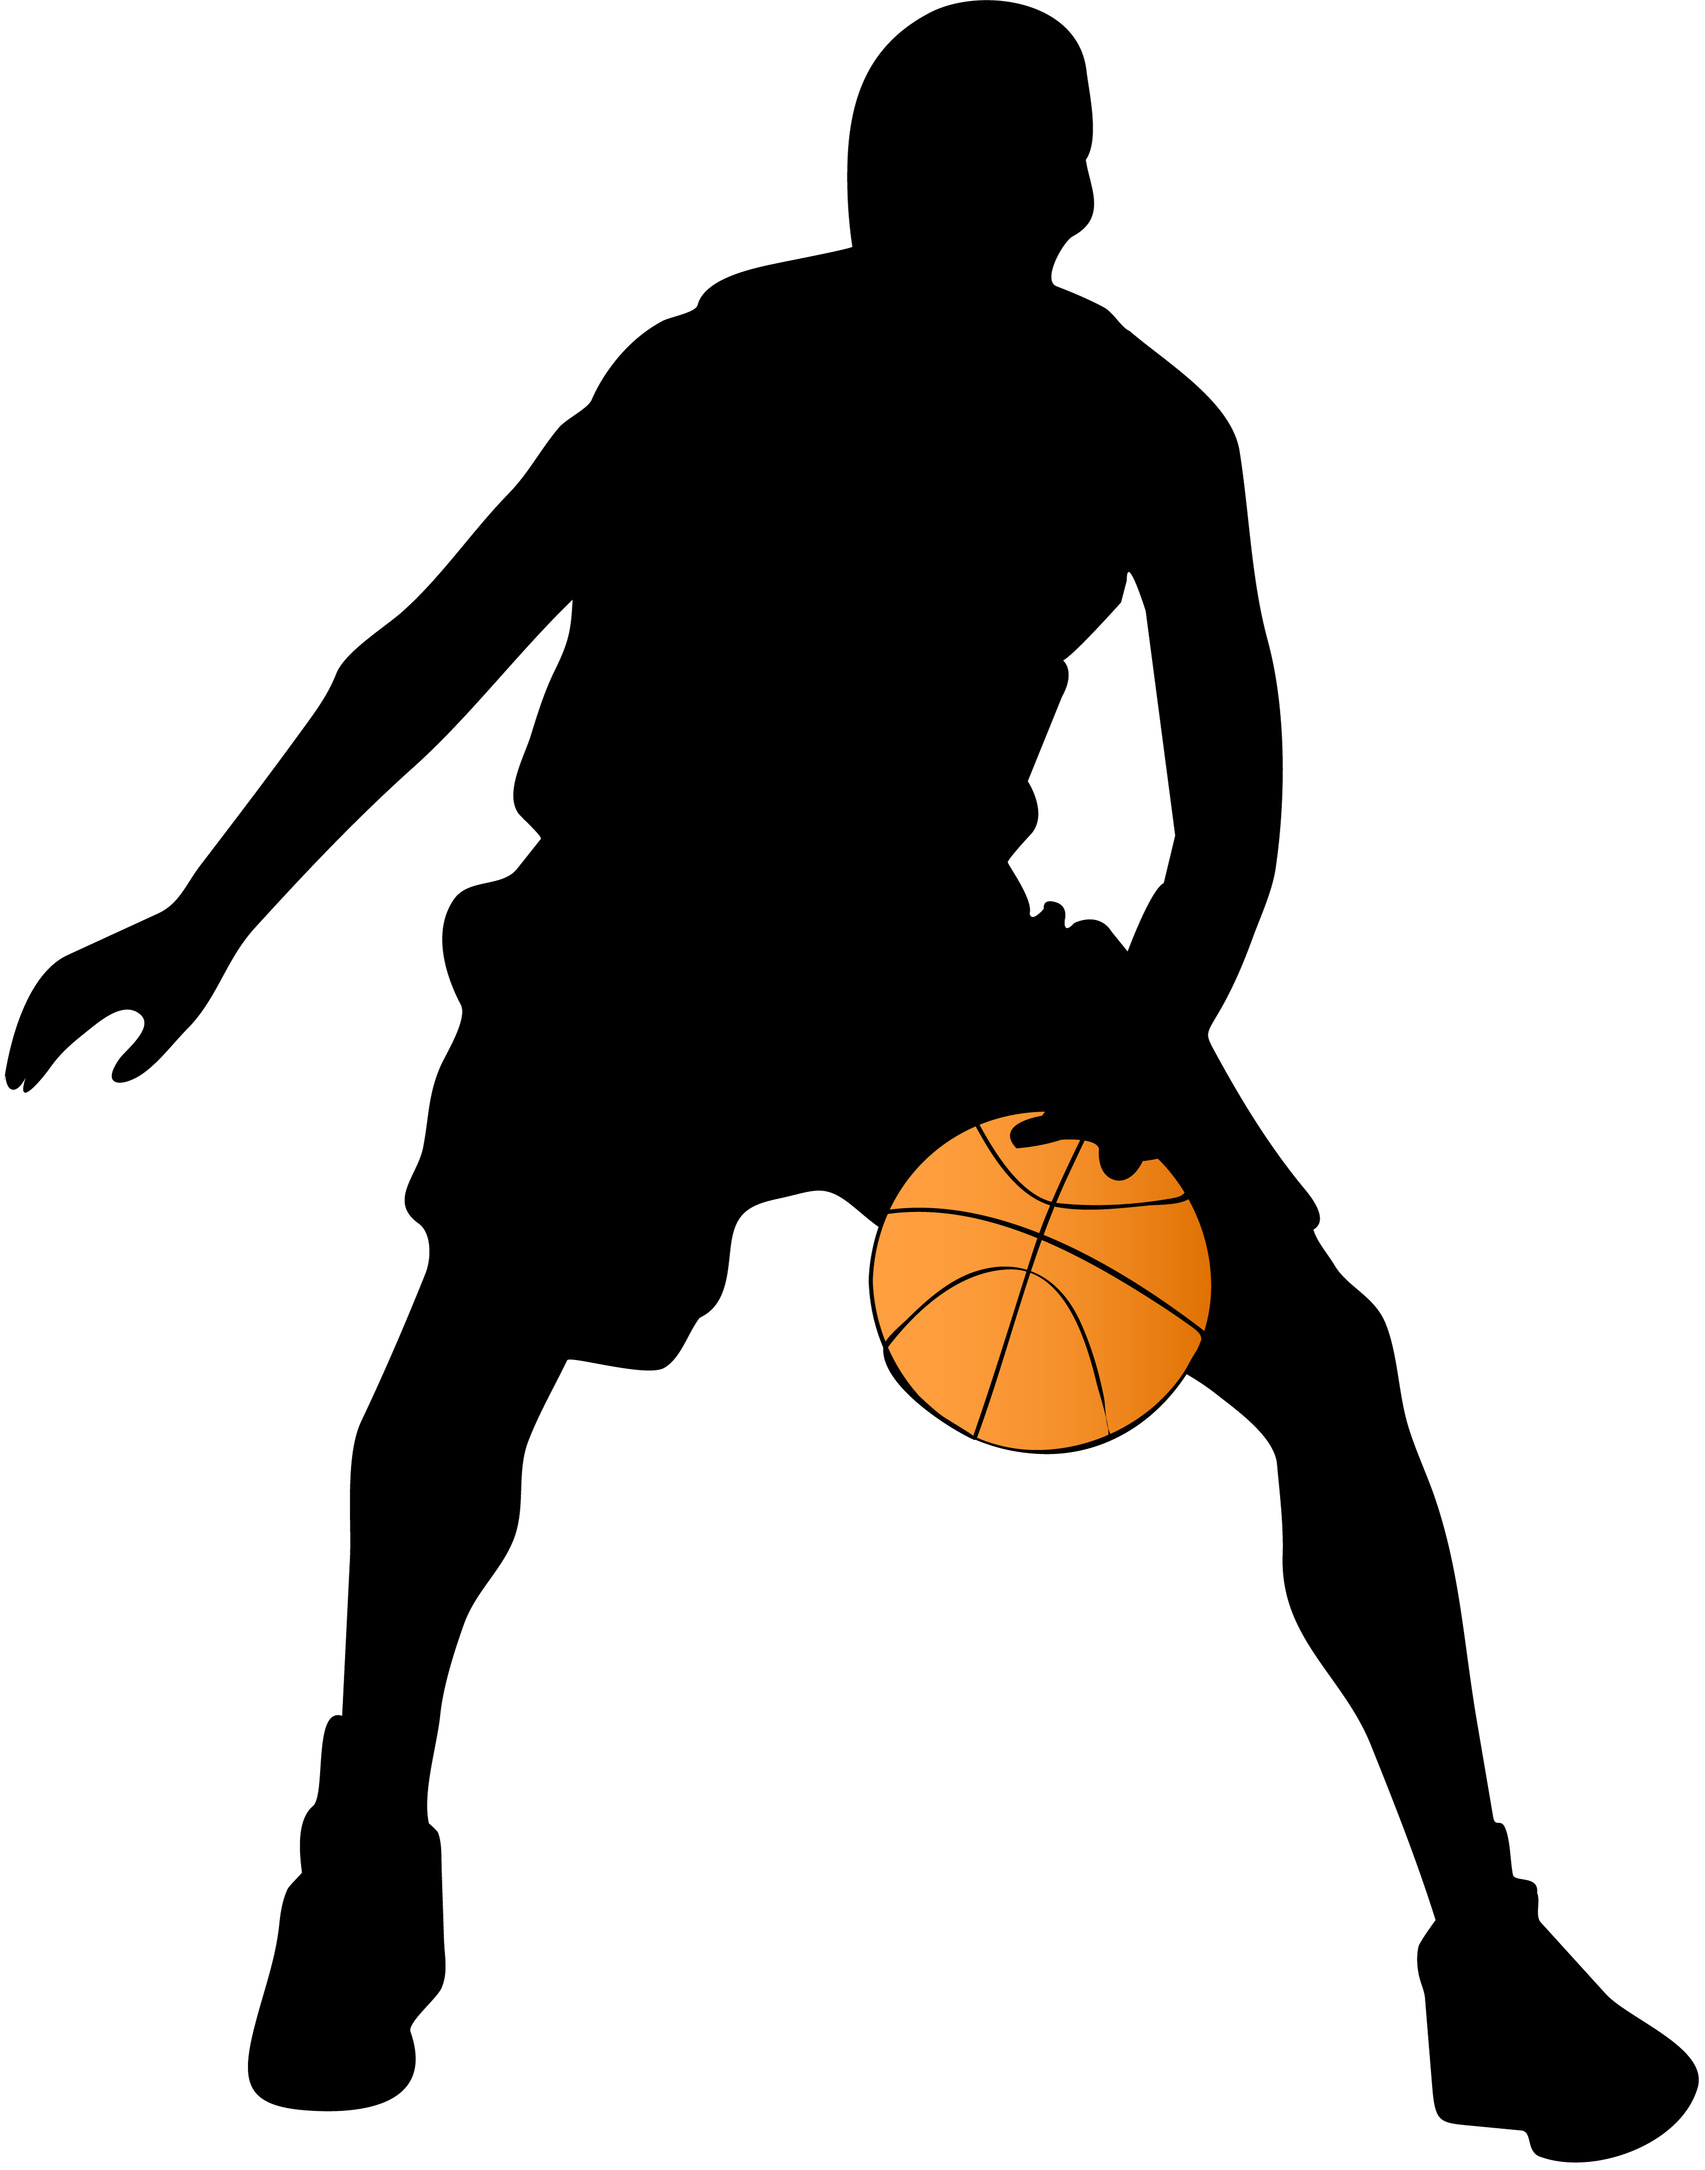 1705x2170 Basketball Silhouette Clipart